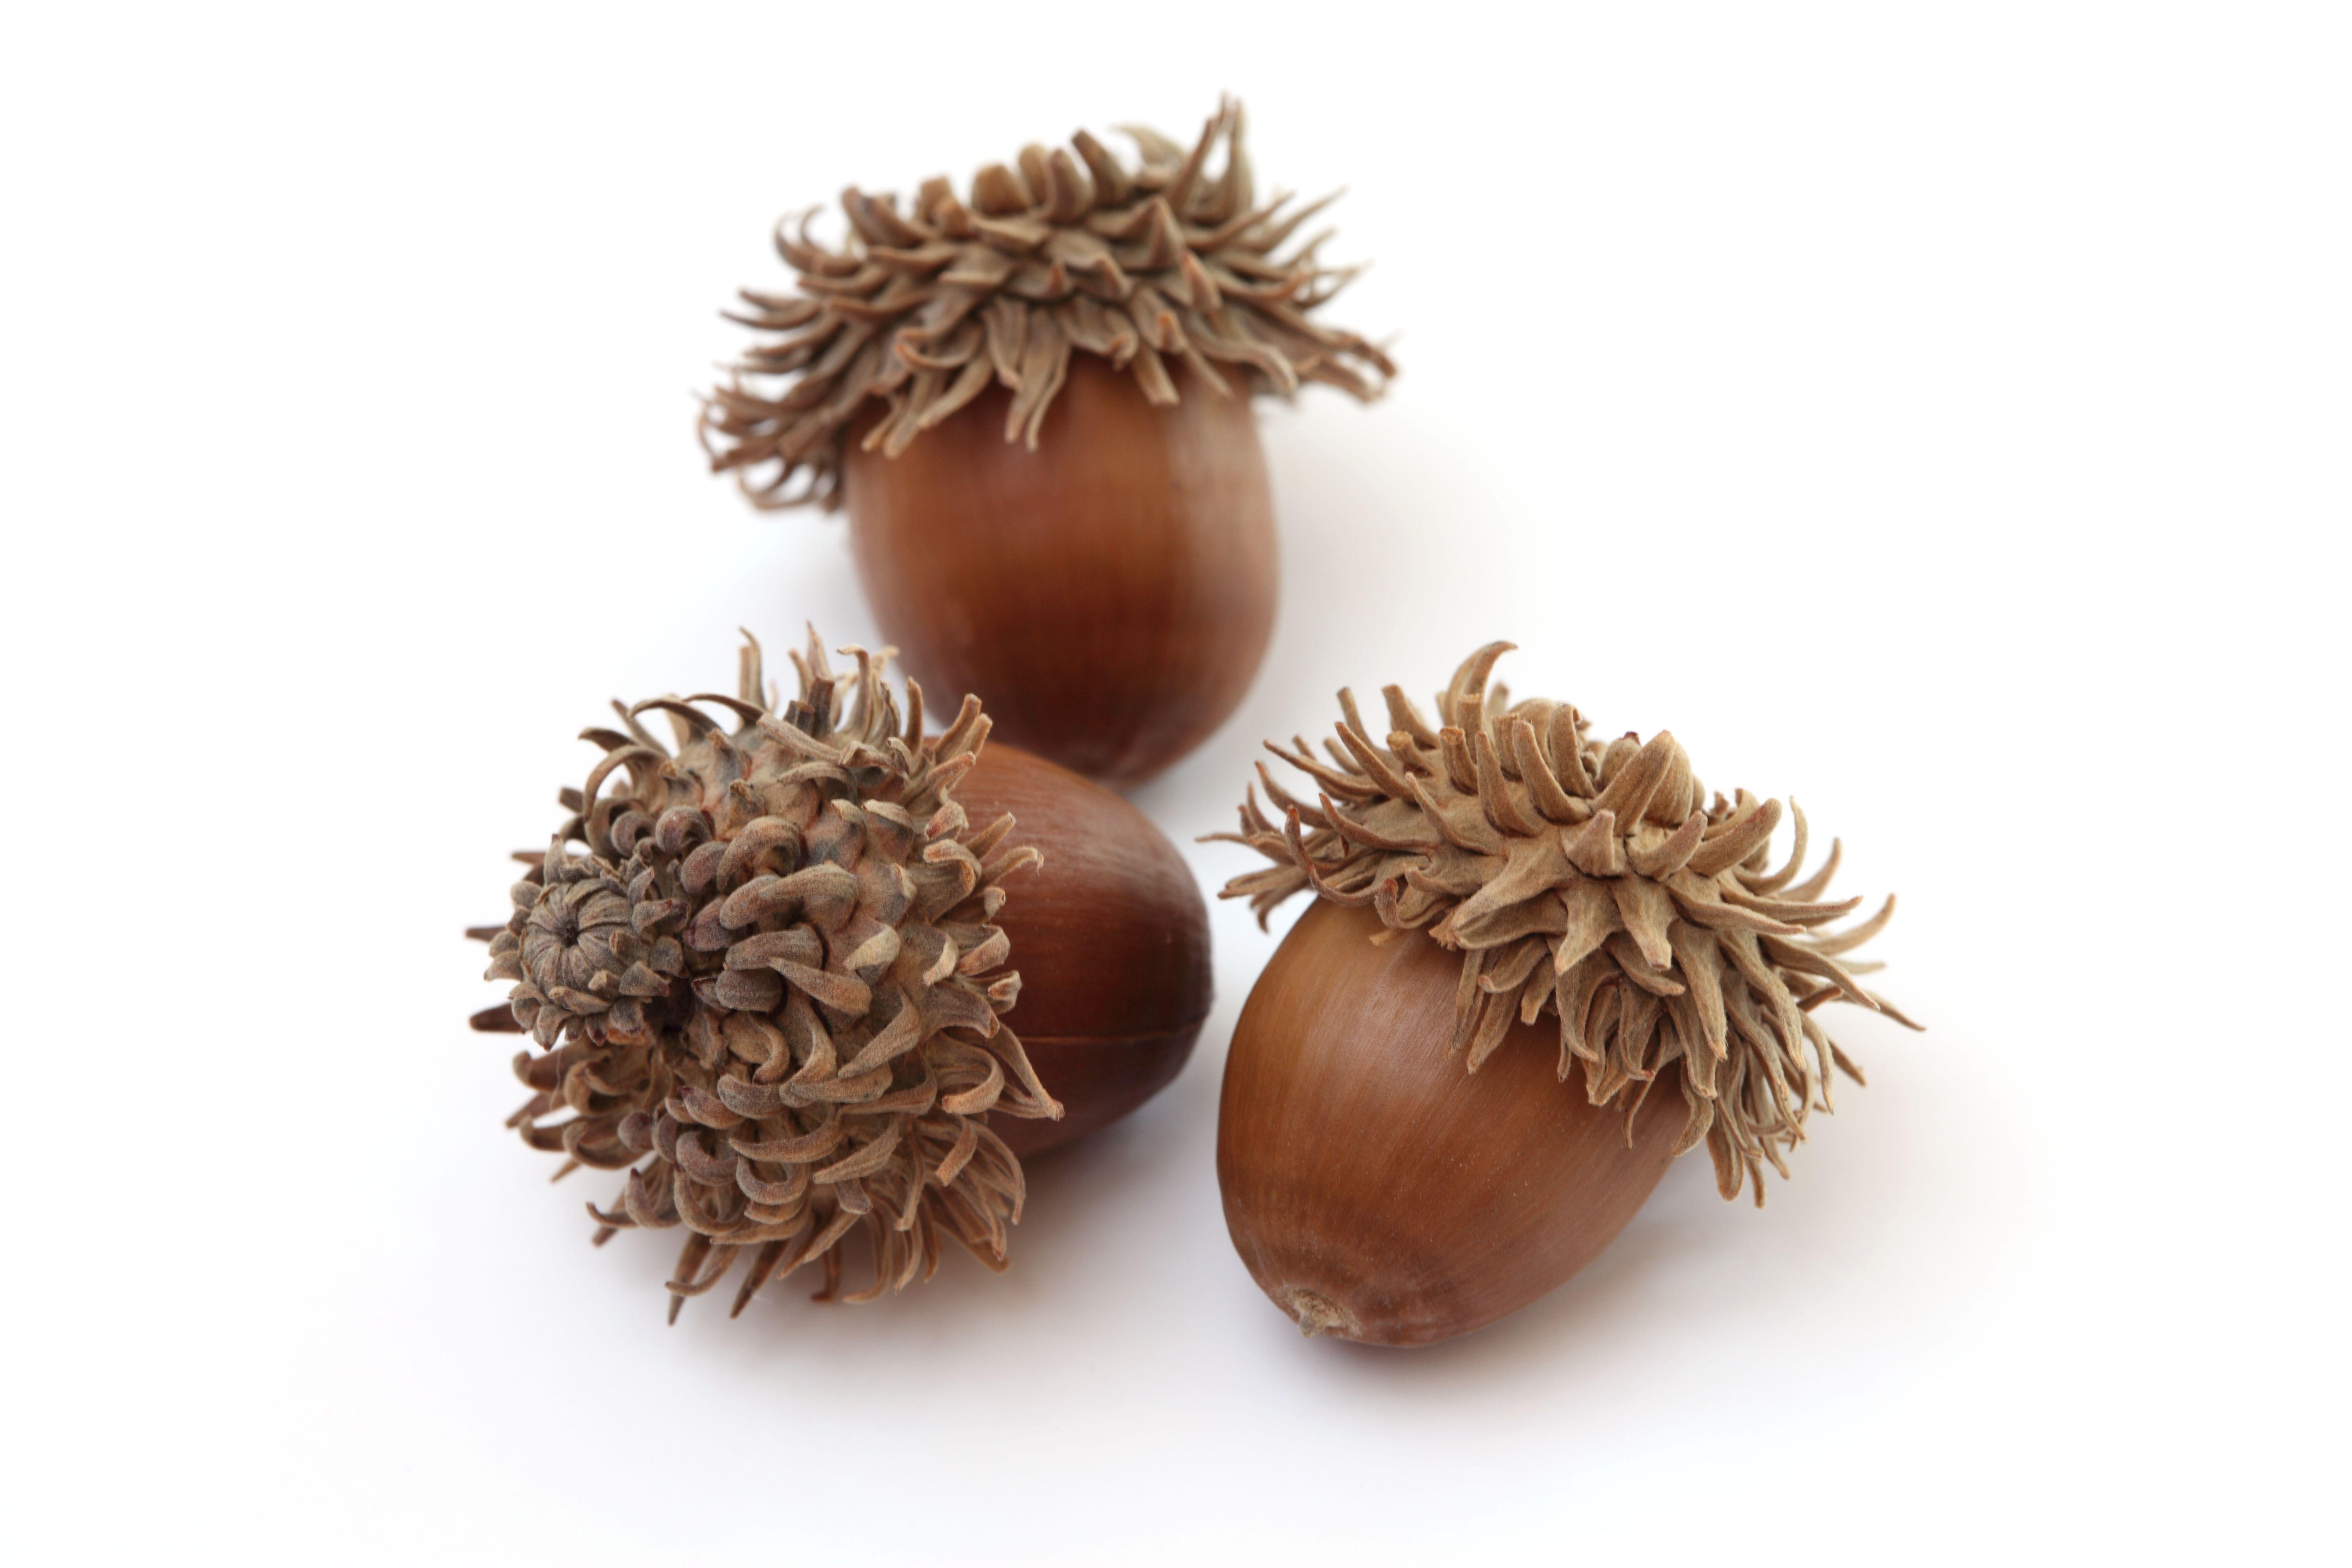 sawtooth acorns